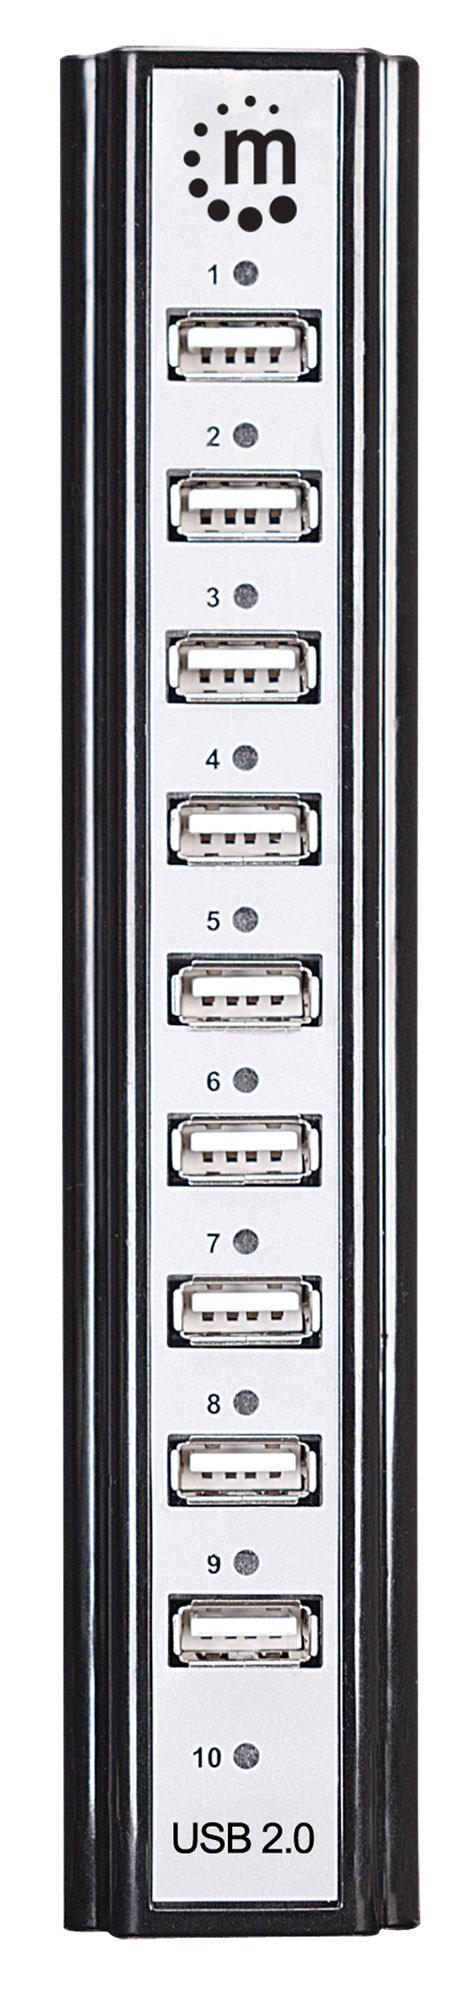 Hi-Speed USB Desktop Hub